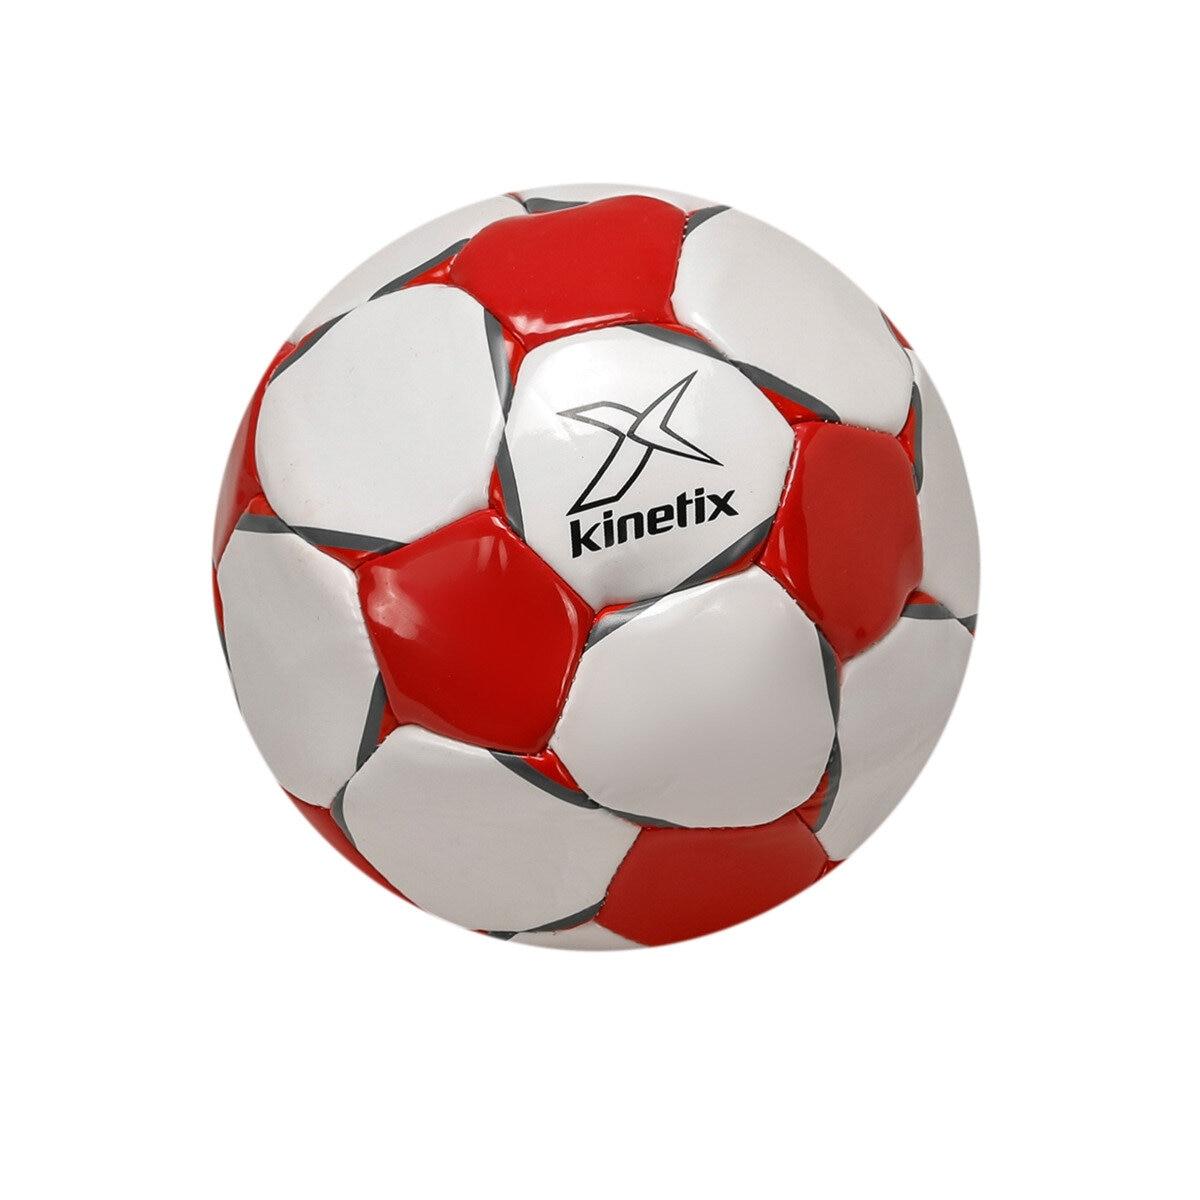 FLO PABLO Multicolour Unisex Soccer Ball KINETIX